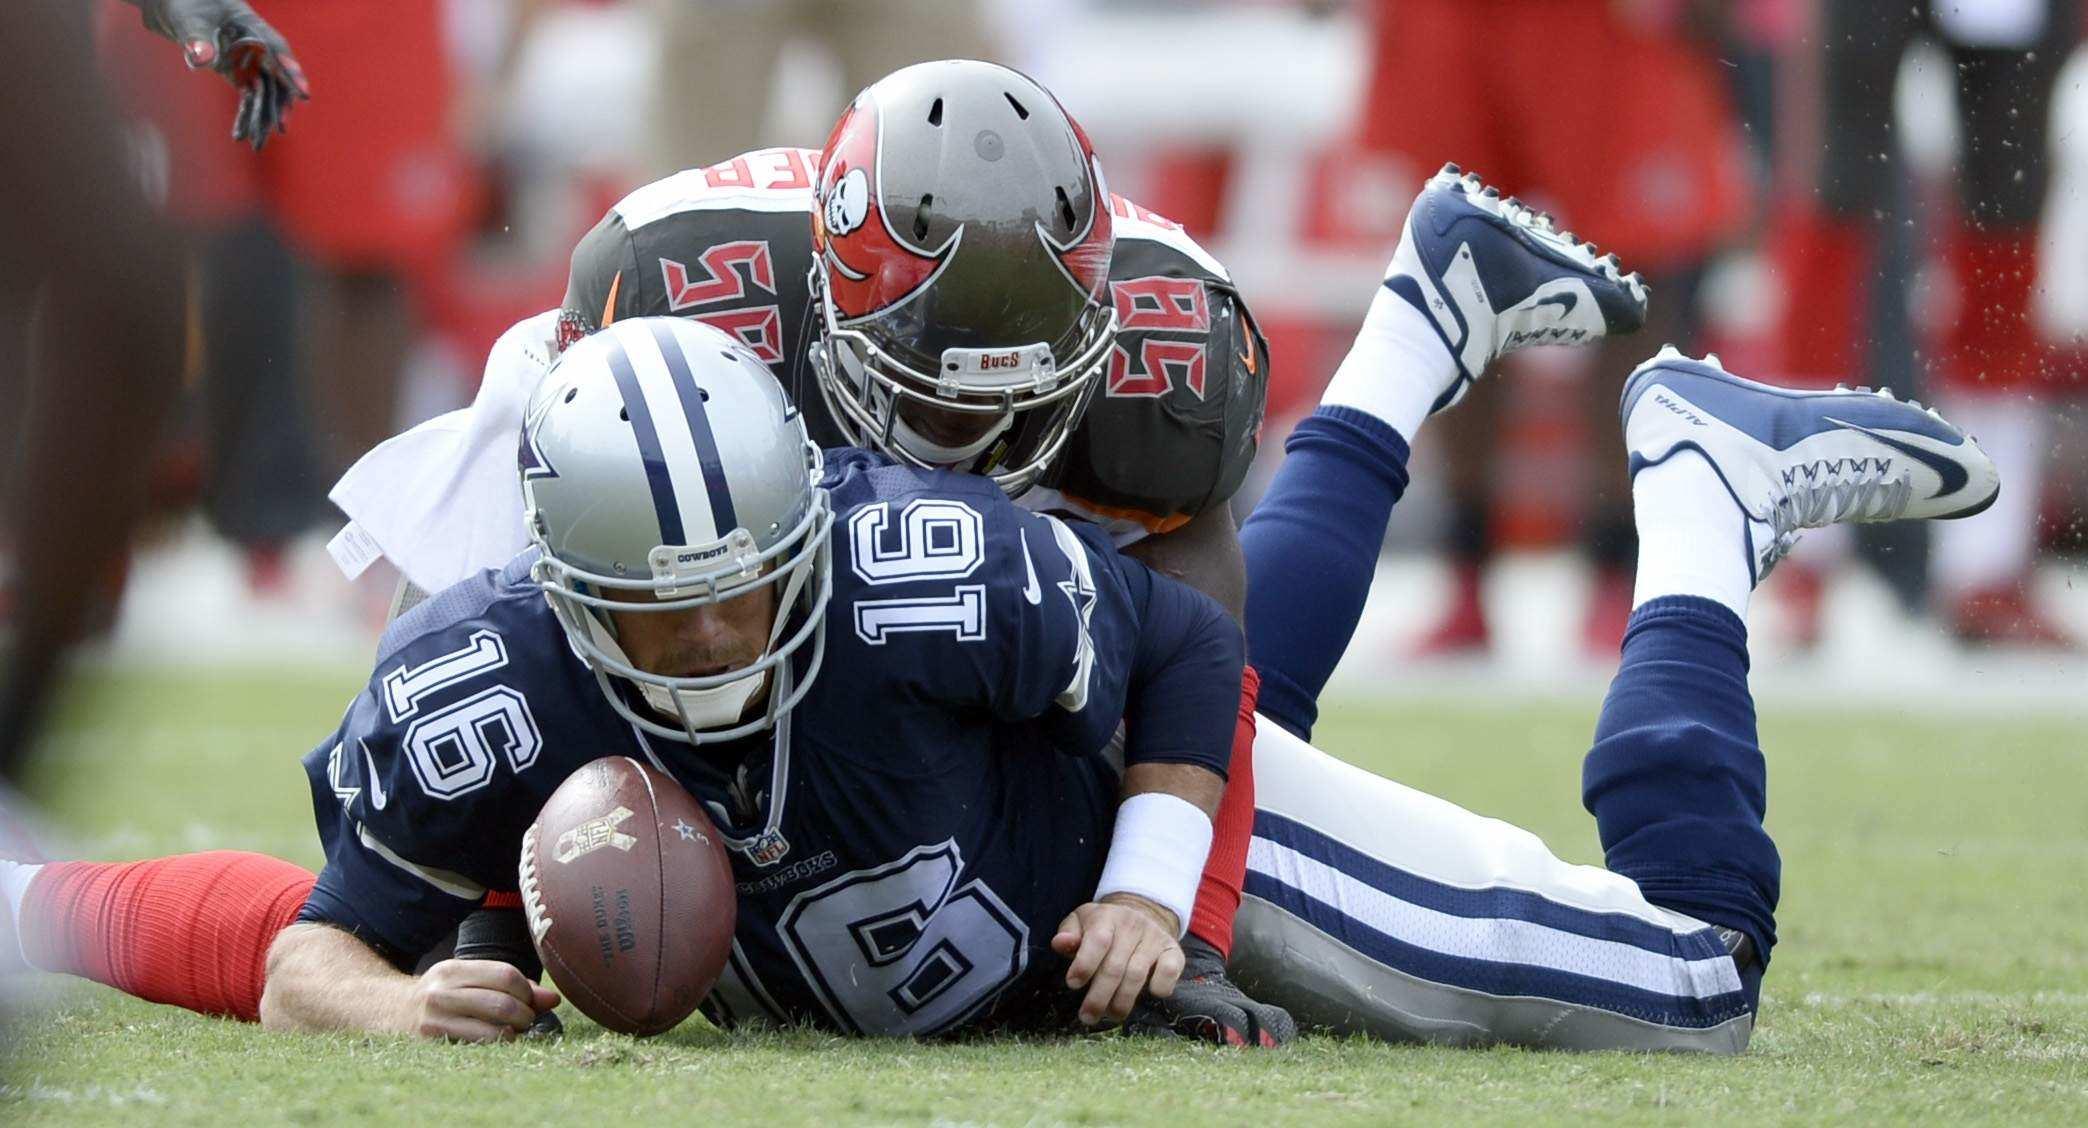 Cowboys Blog - Grading the Bucs Game